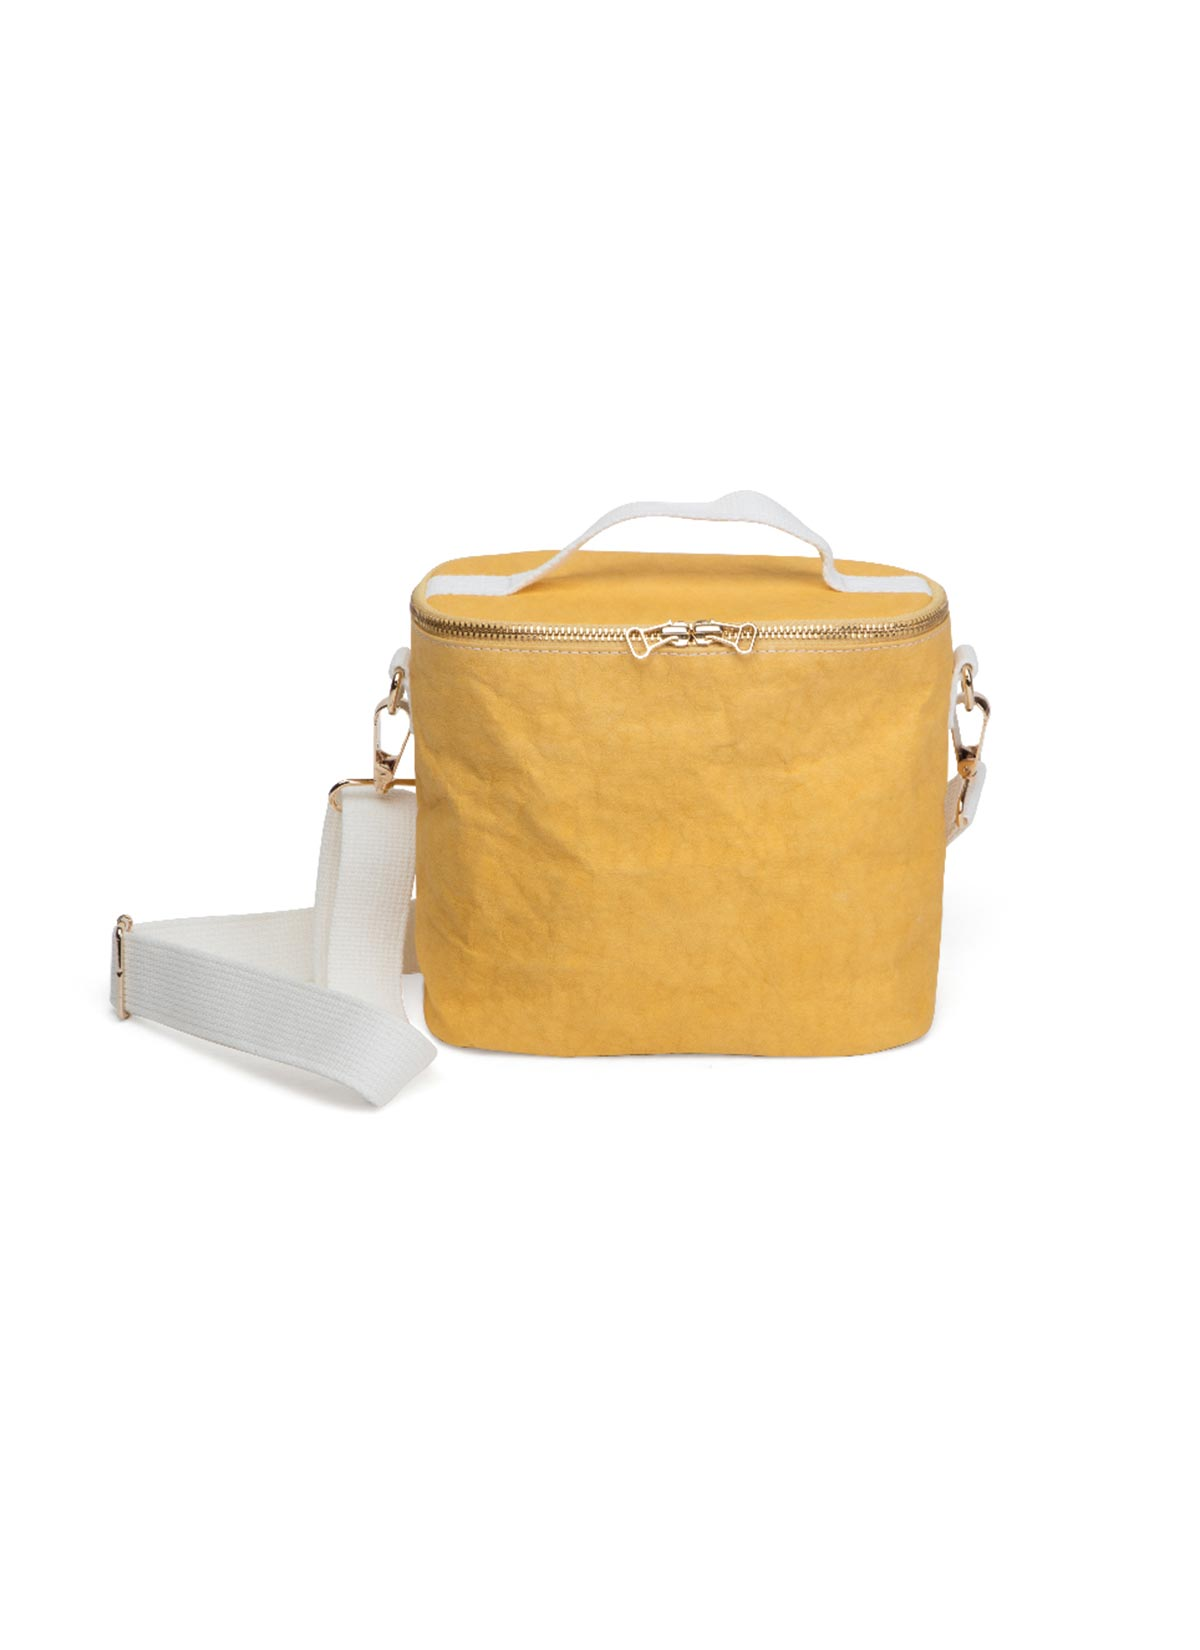 The Bag Mustard